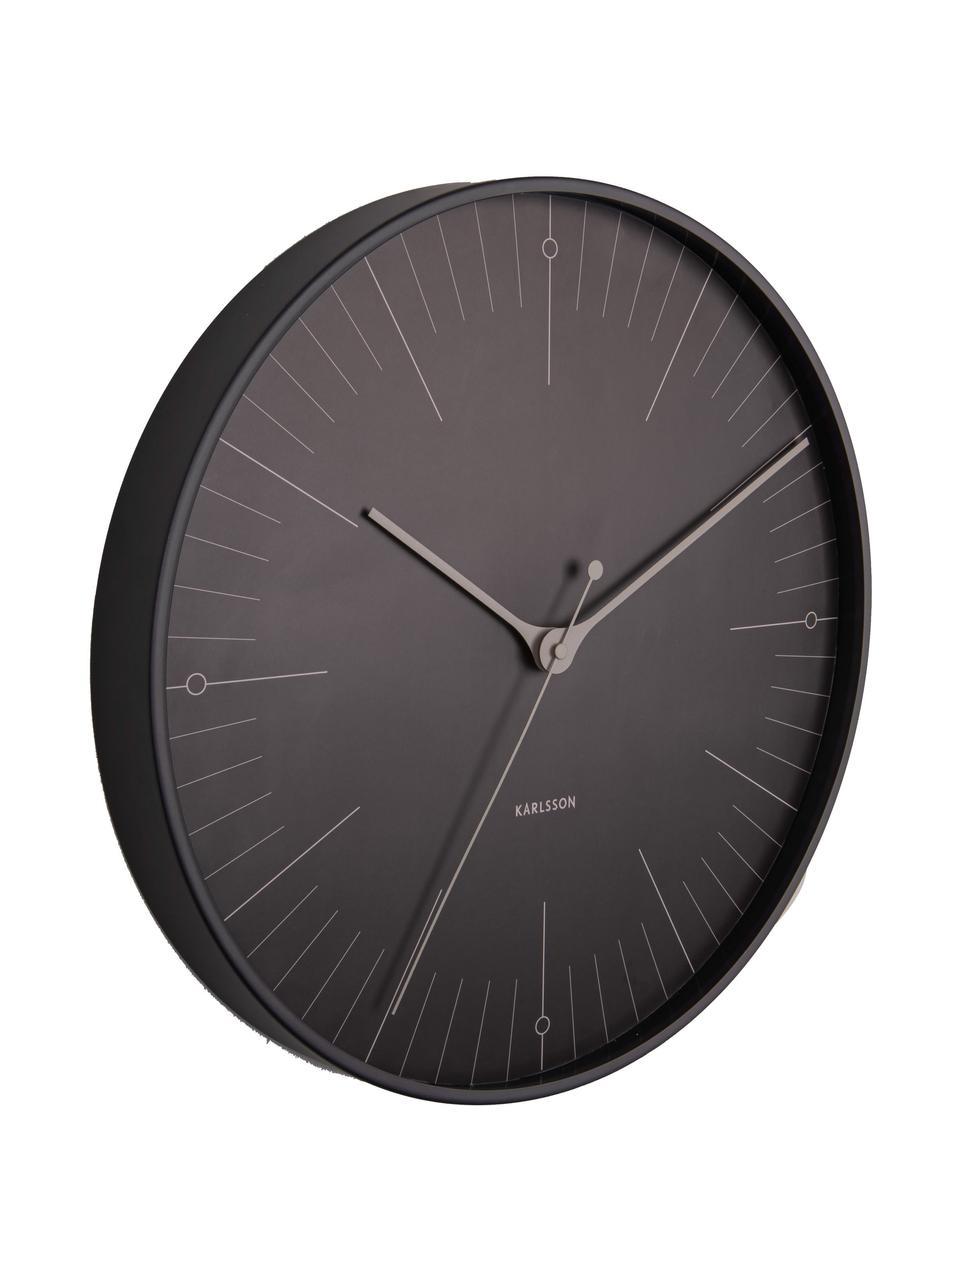 Wanduhr Index, Metall, beschichtet, Schwarz, Grau, Ø 40 cm